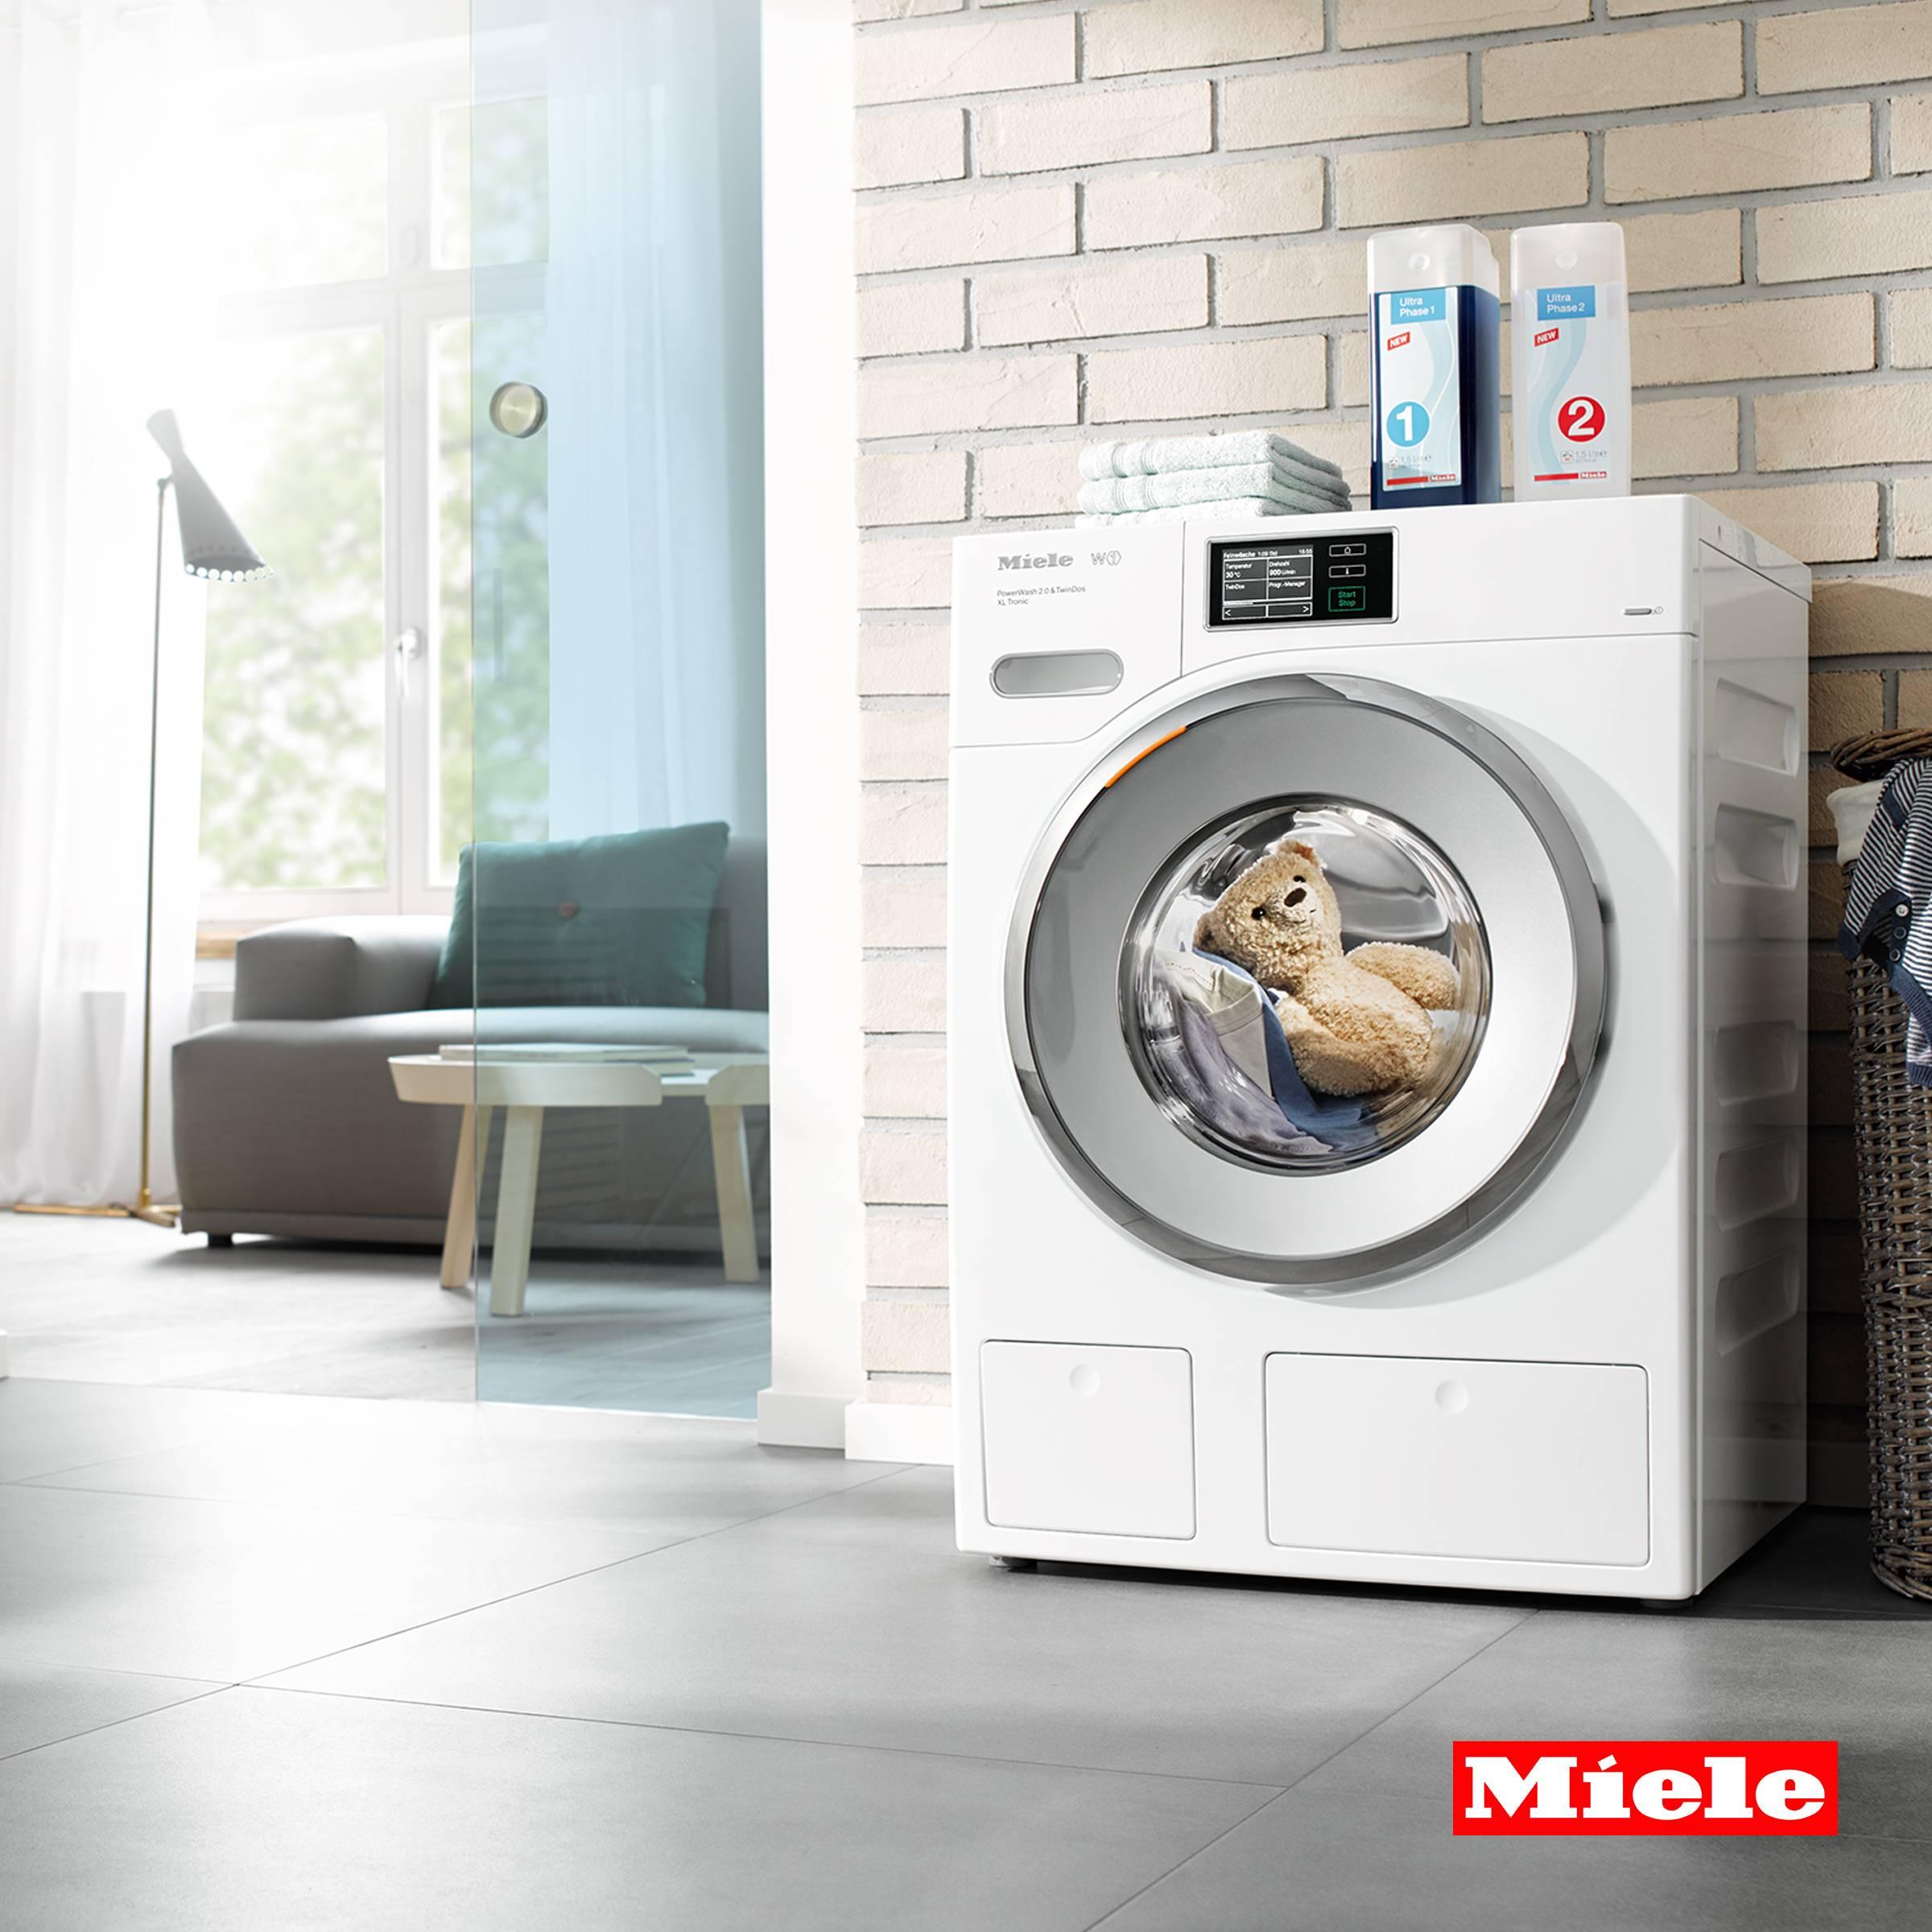 Miele washing machines